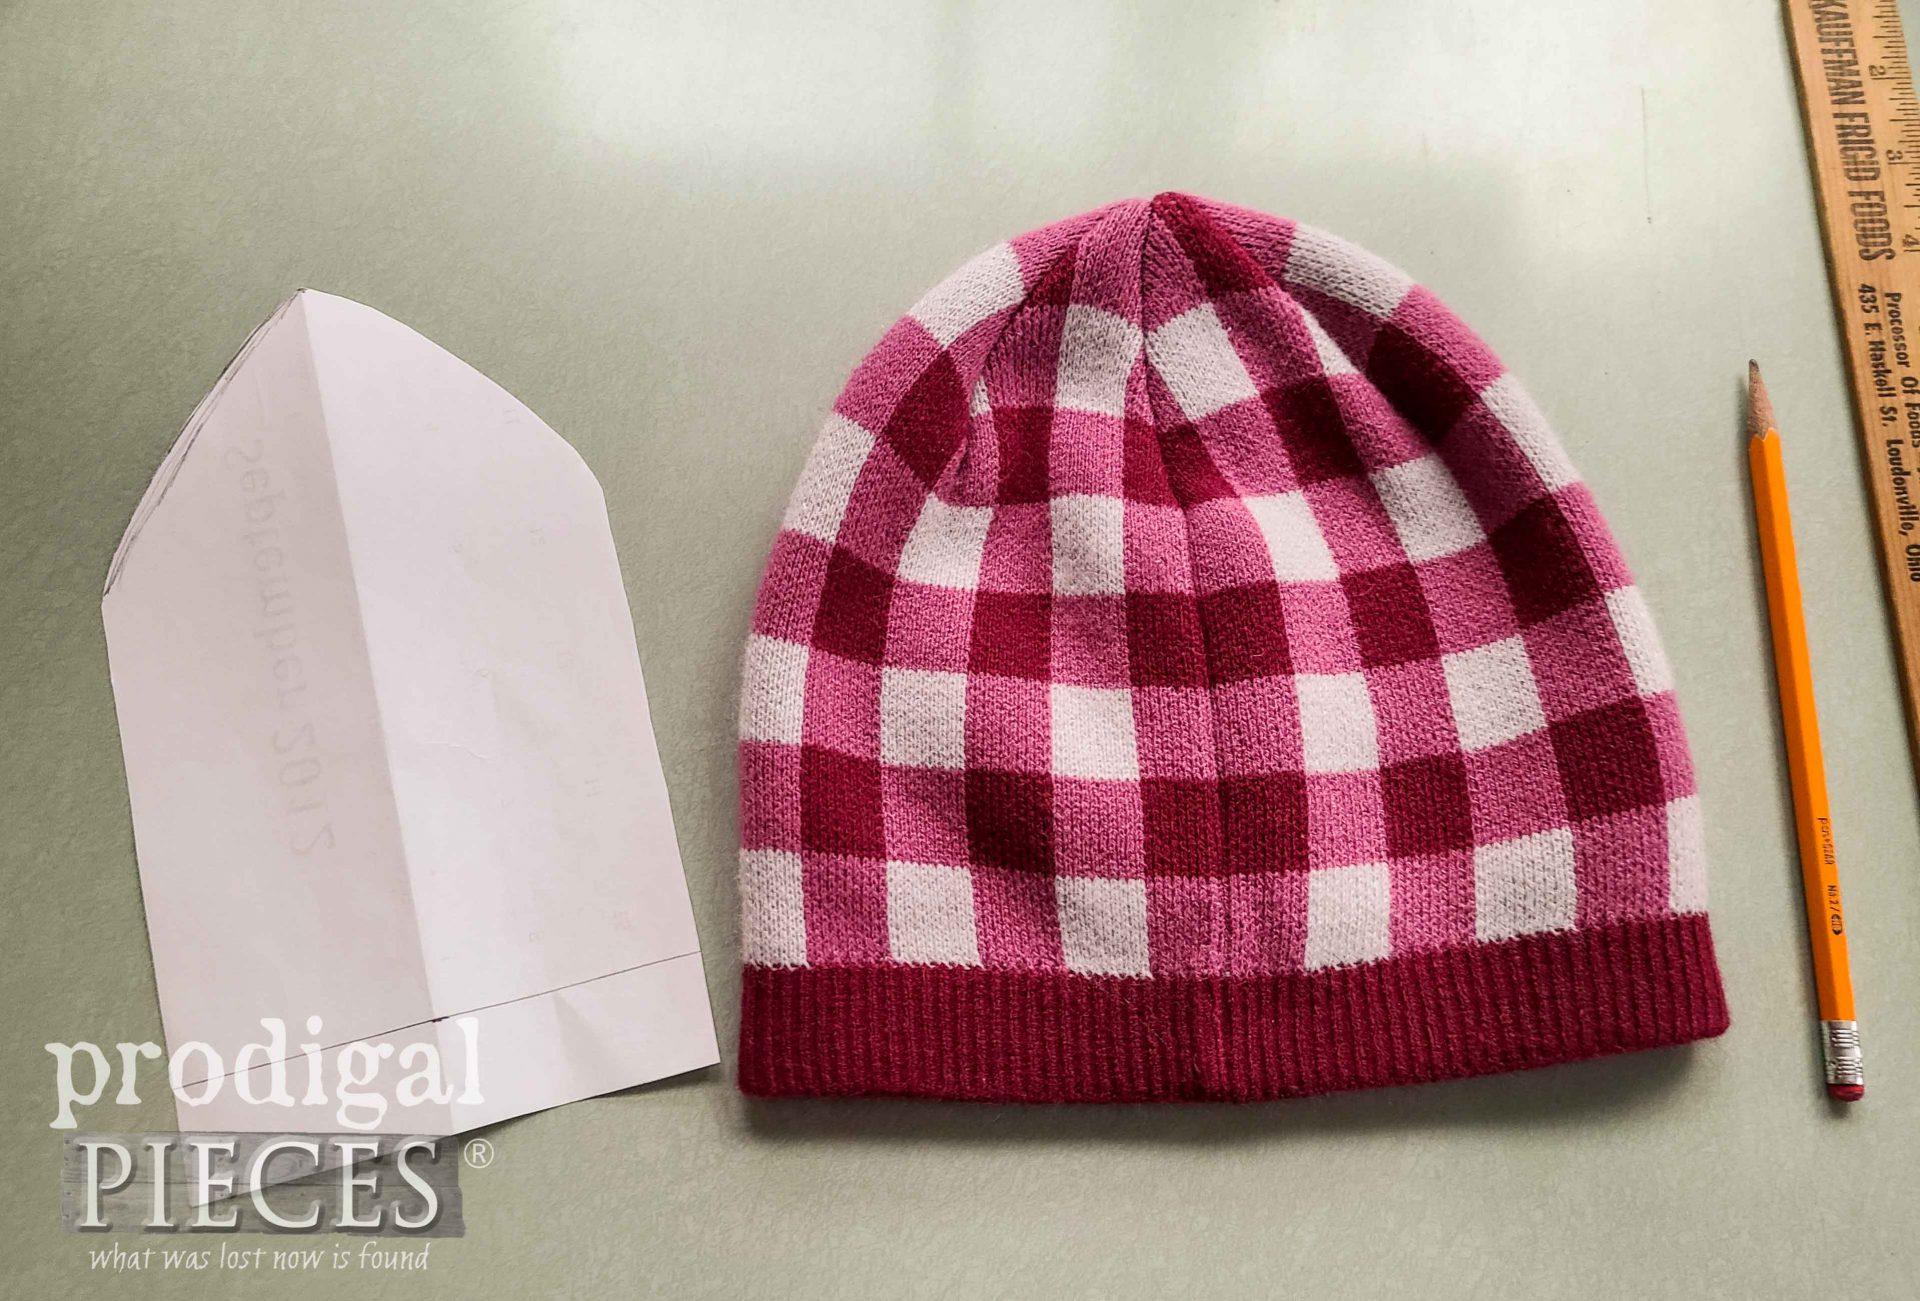 Felted Wool Hat Pattern | Prodigal Pieces | prodigalpieces.com #prodigalpieces